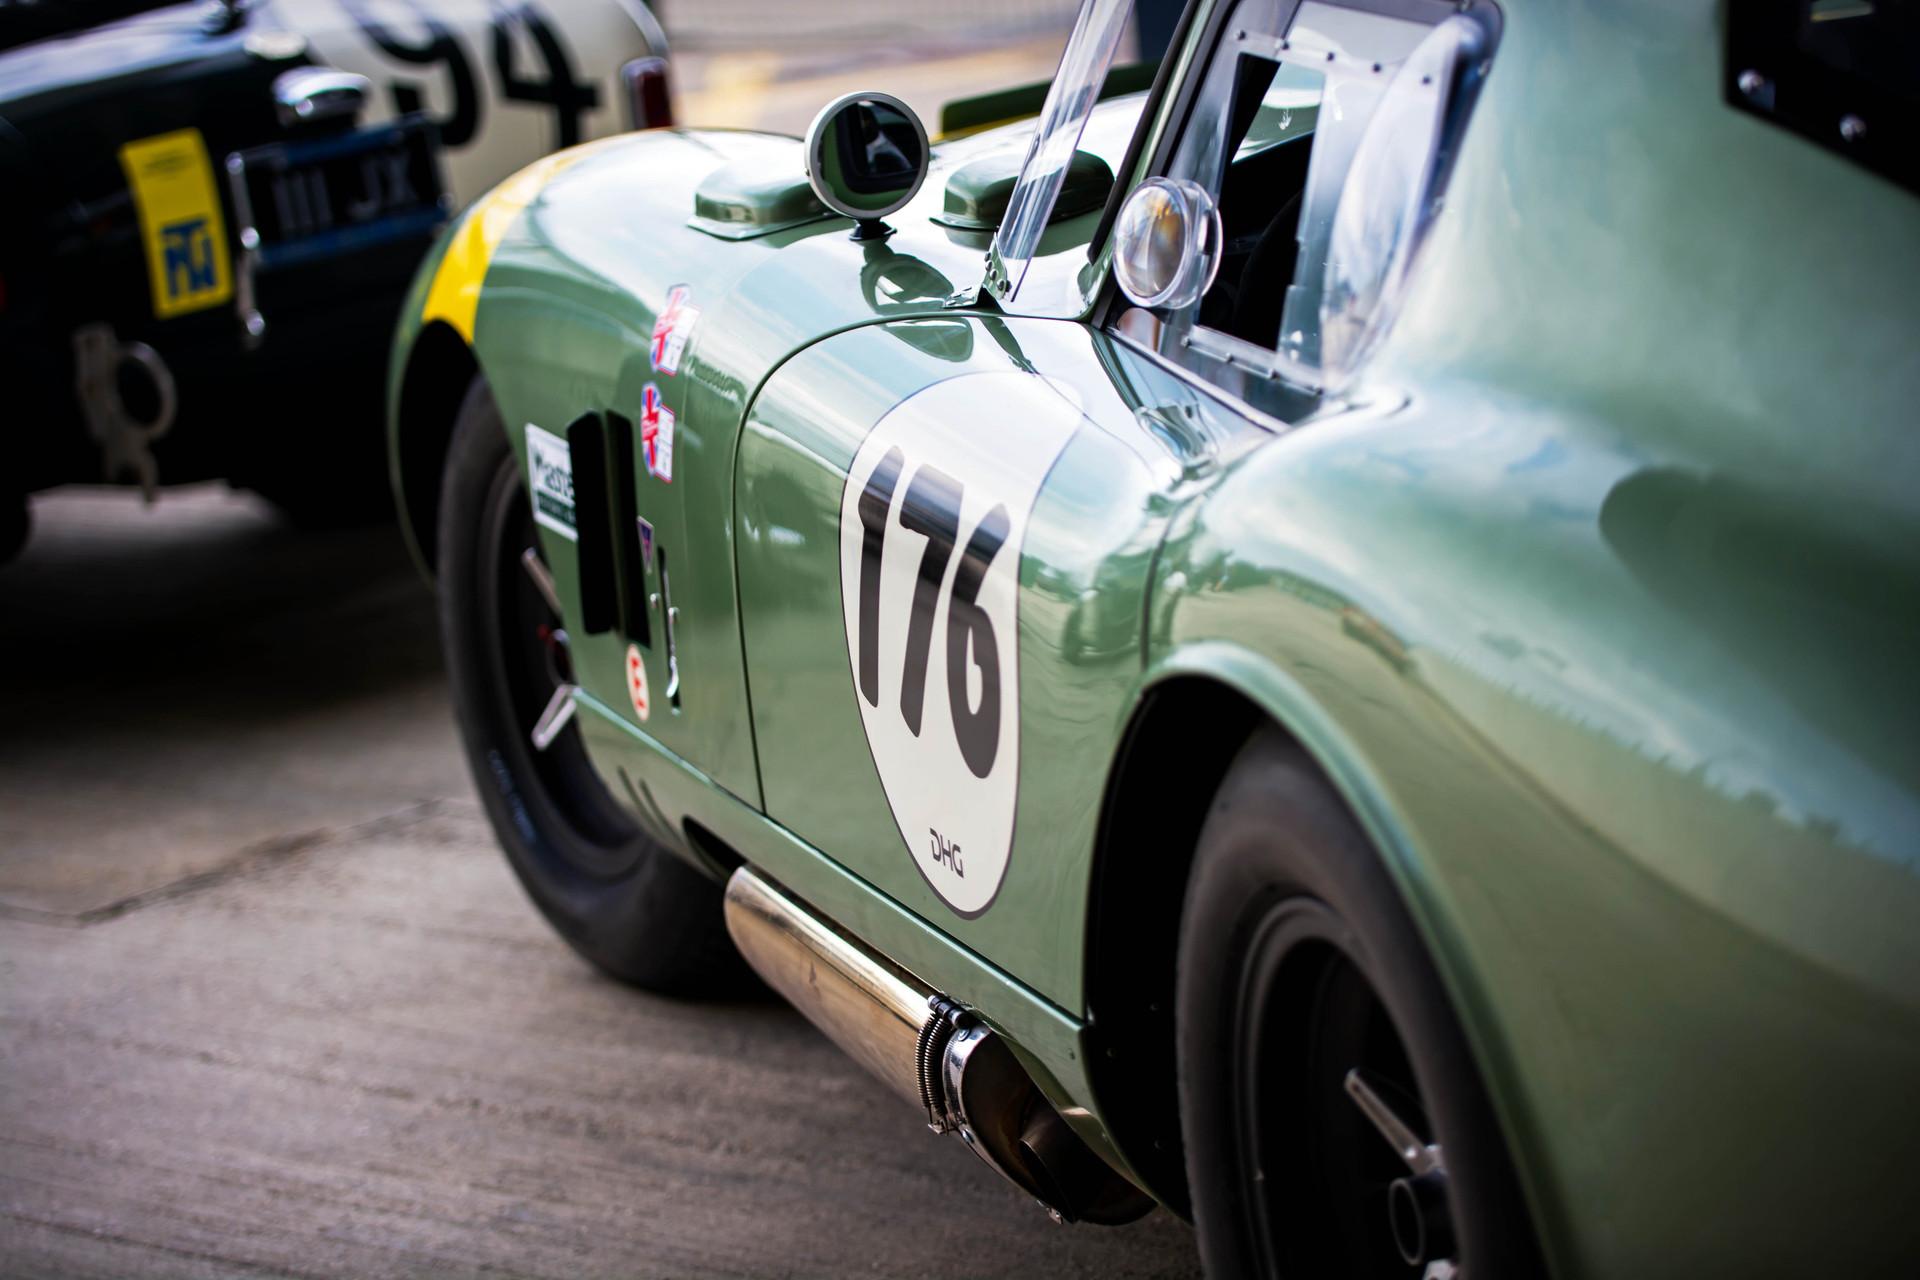 David & Olivier Hart's 1965 AC Cobra Daytona